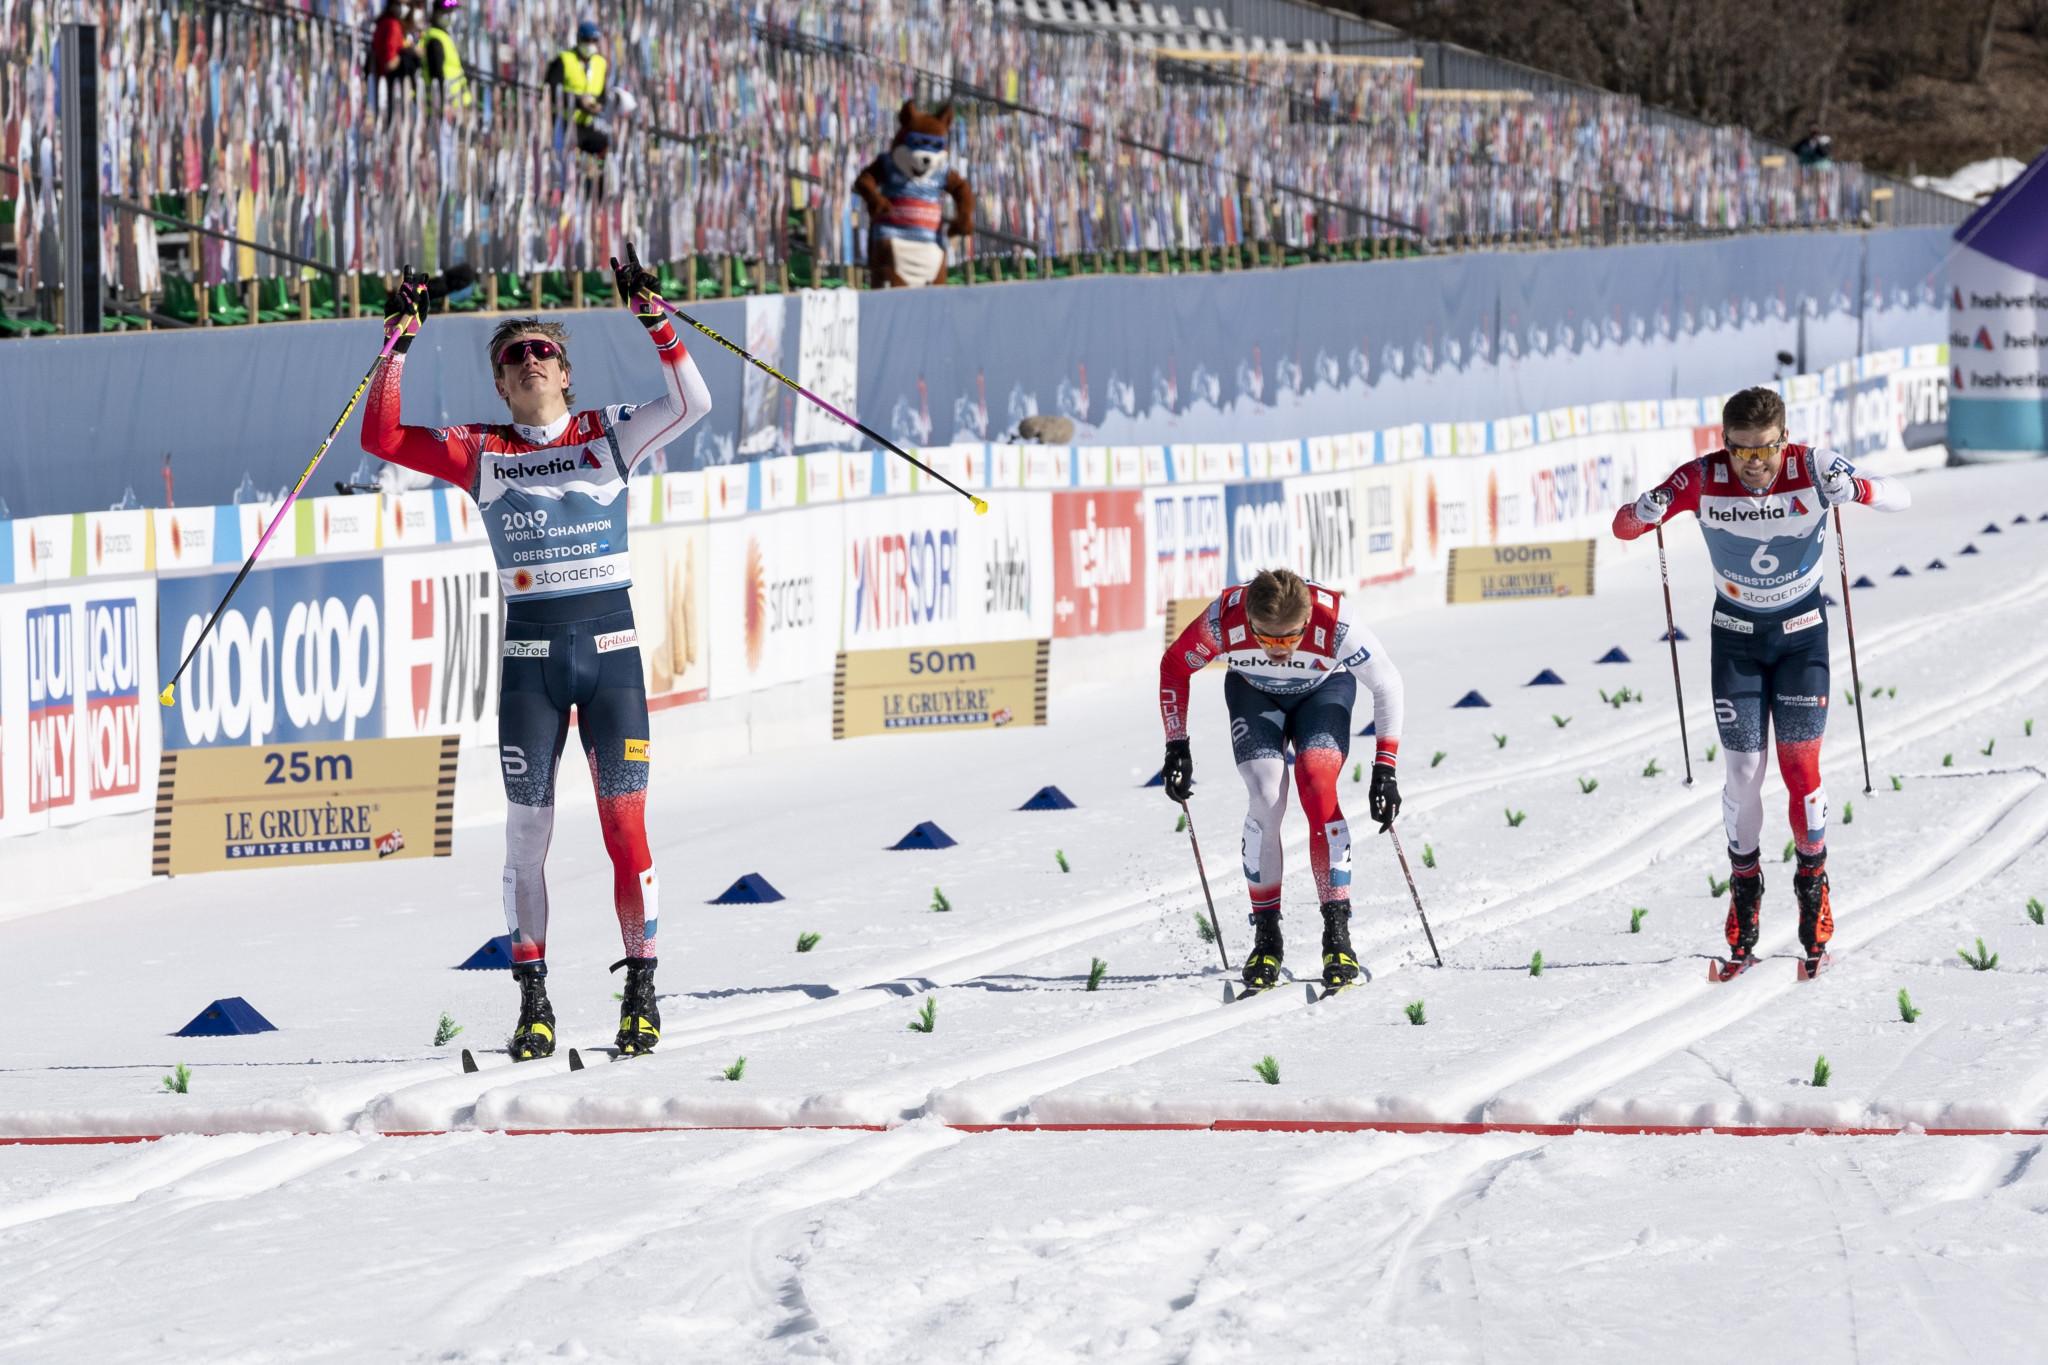 Johannes Høsflot Klæbo, left, led a Norwegian clean sweep in the men's cross-country sprint event ©Getty Images